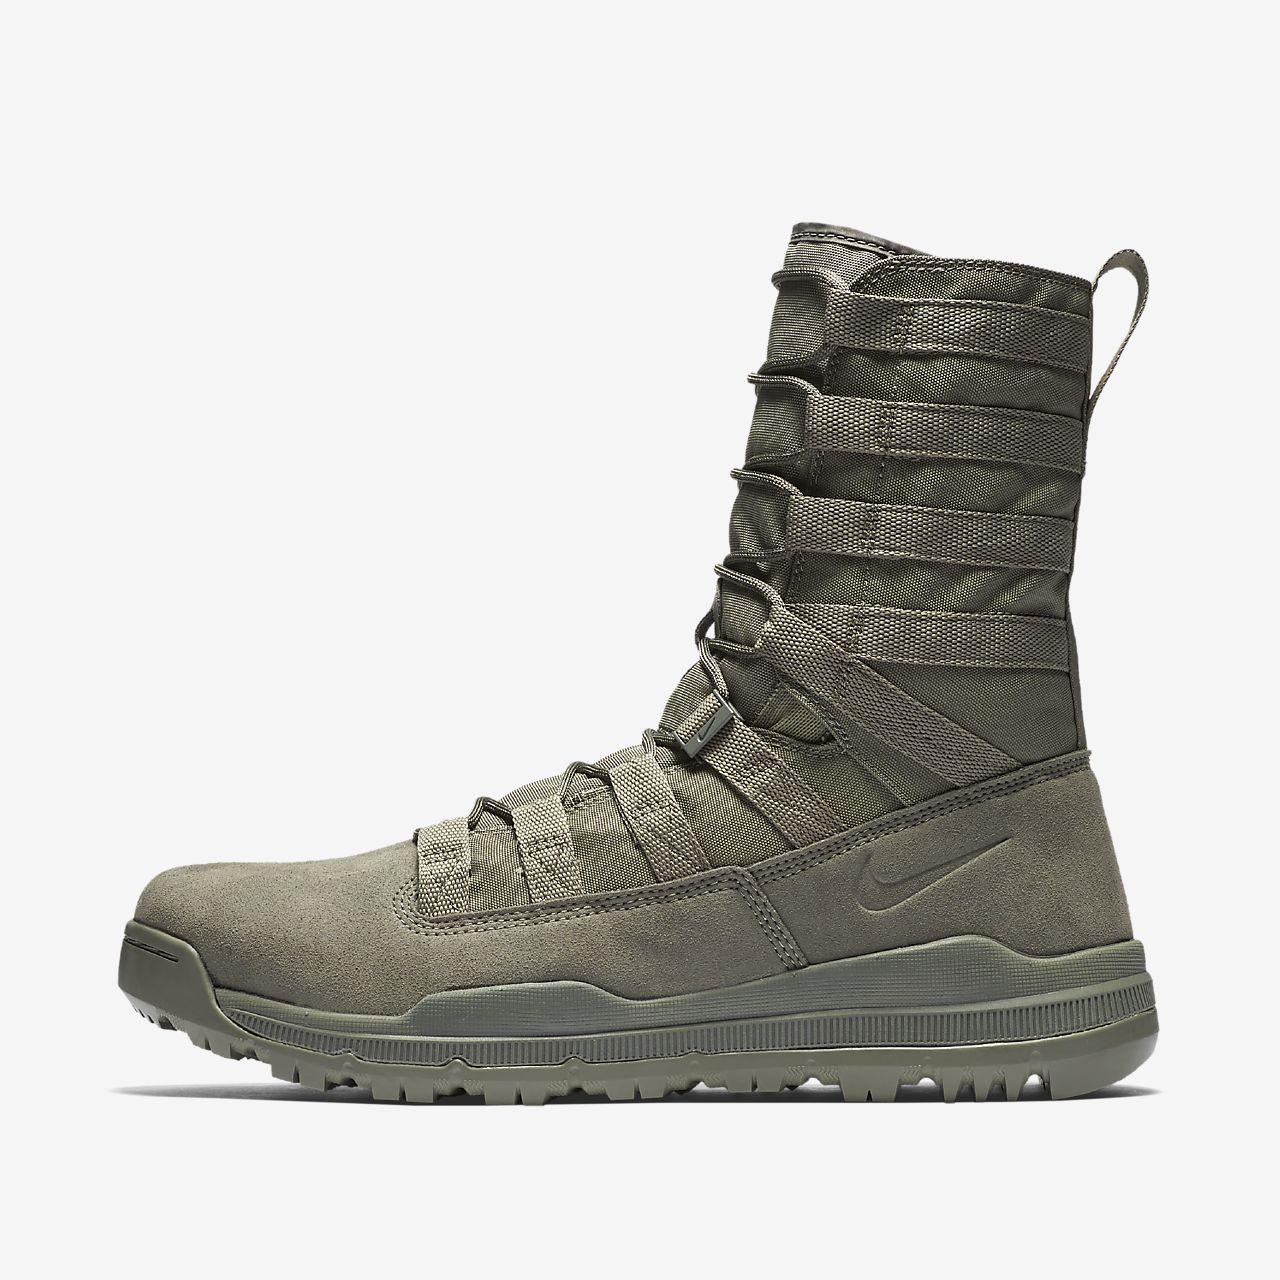 Unisex Boot 113